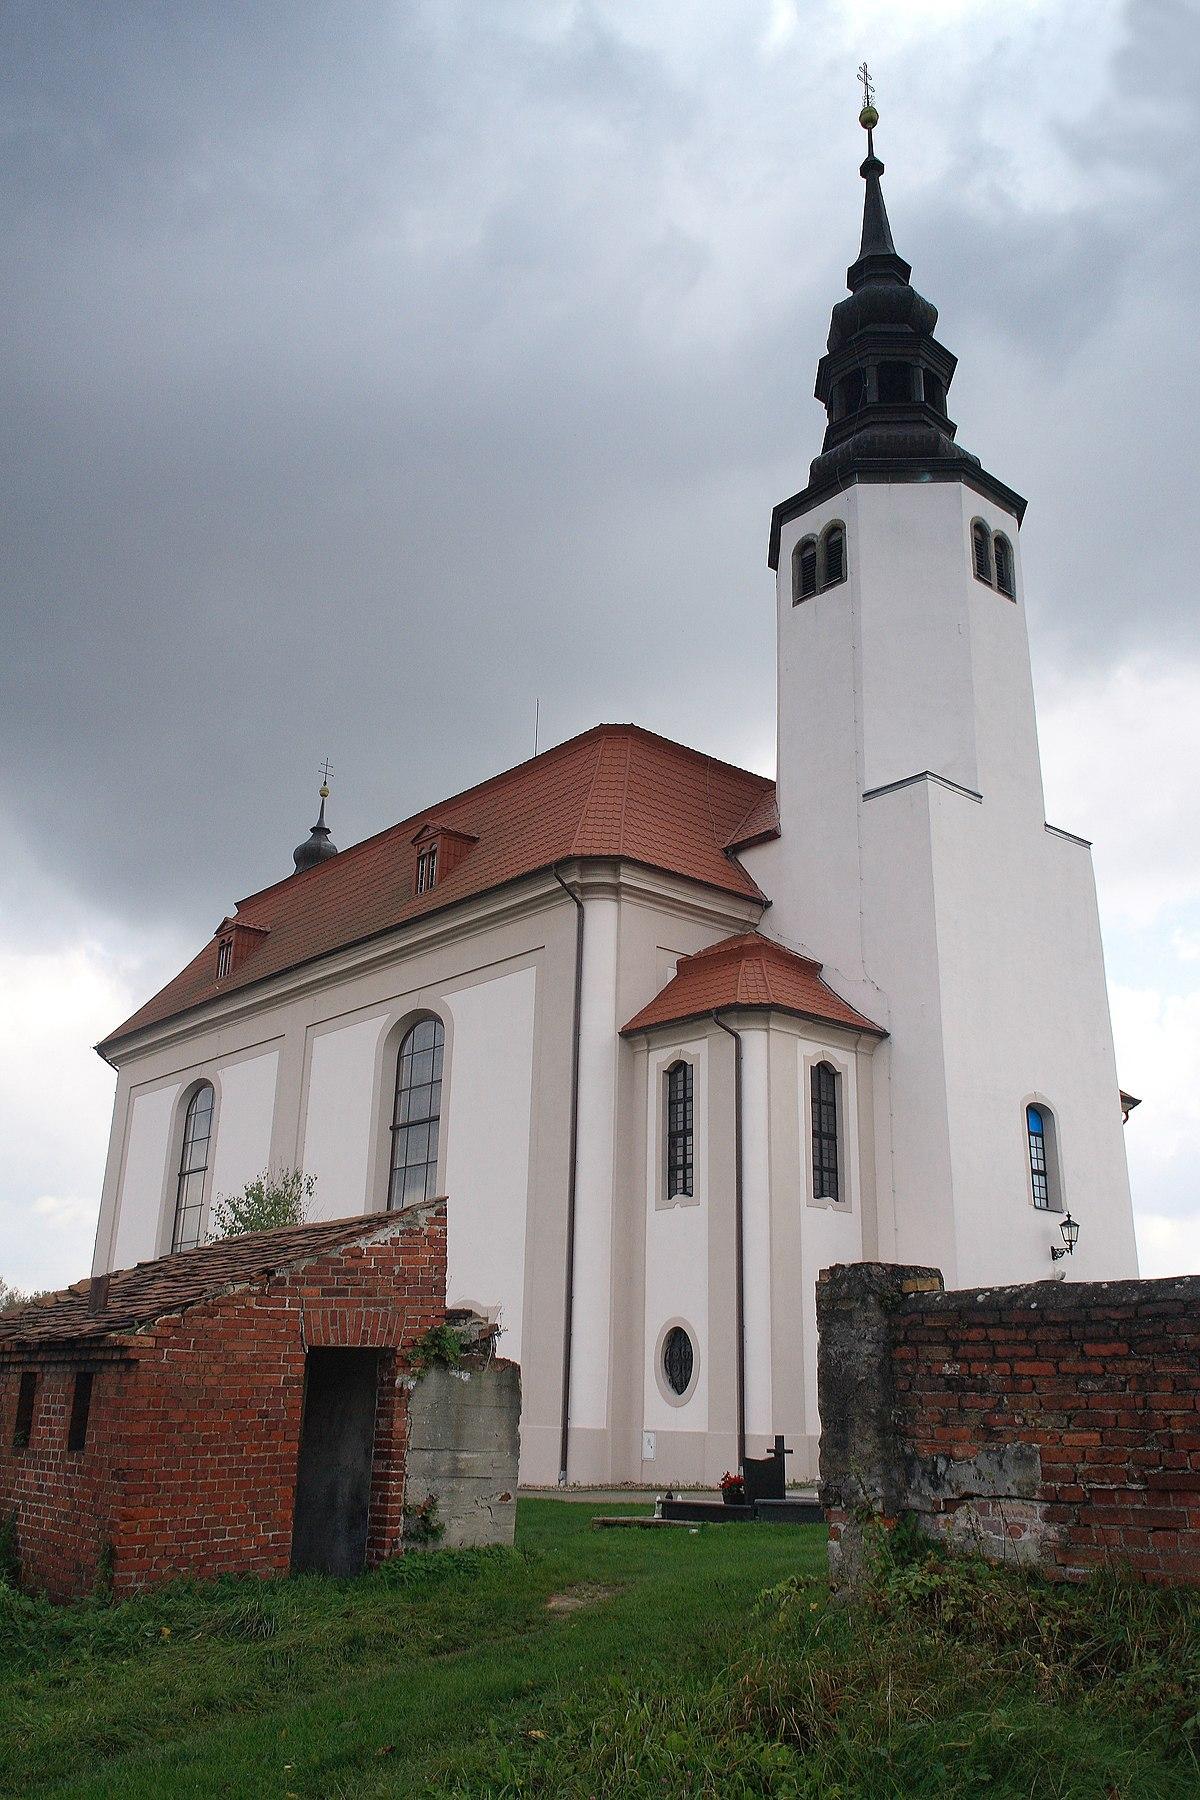 Działoszyn, Lower Silesian Voivodeship Wikipedia